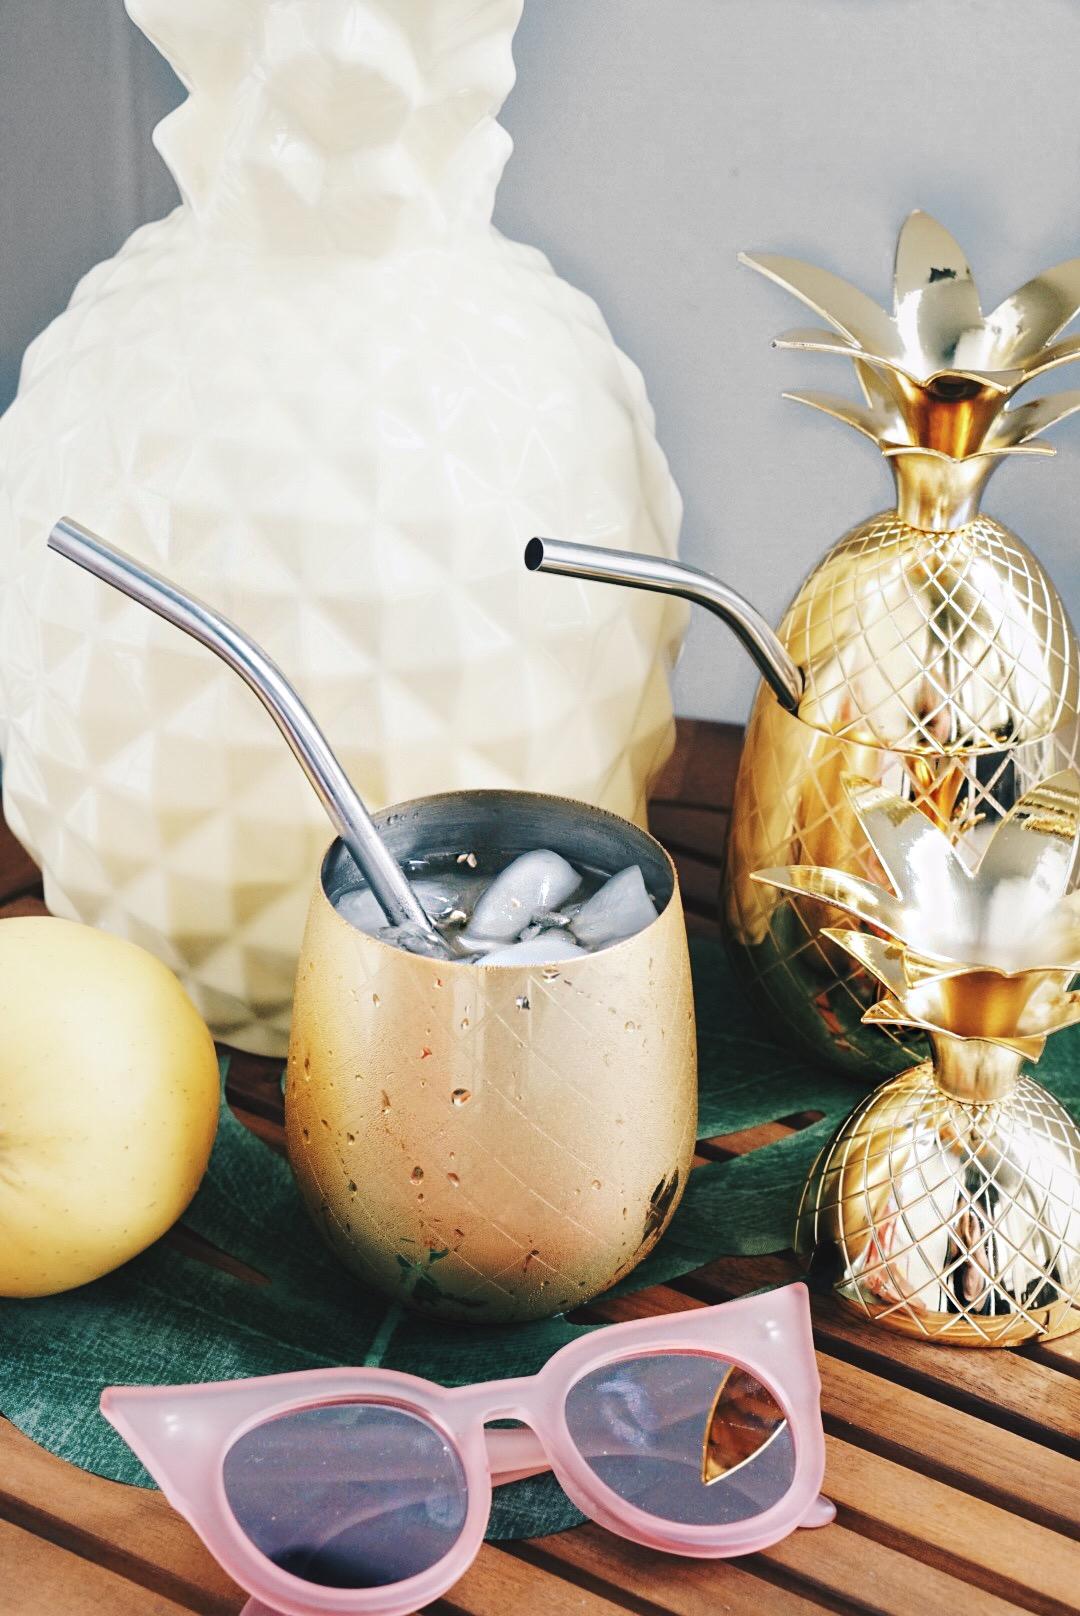 Sugar Love Chic blogger Krista Perez shares summer cocktail recipe